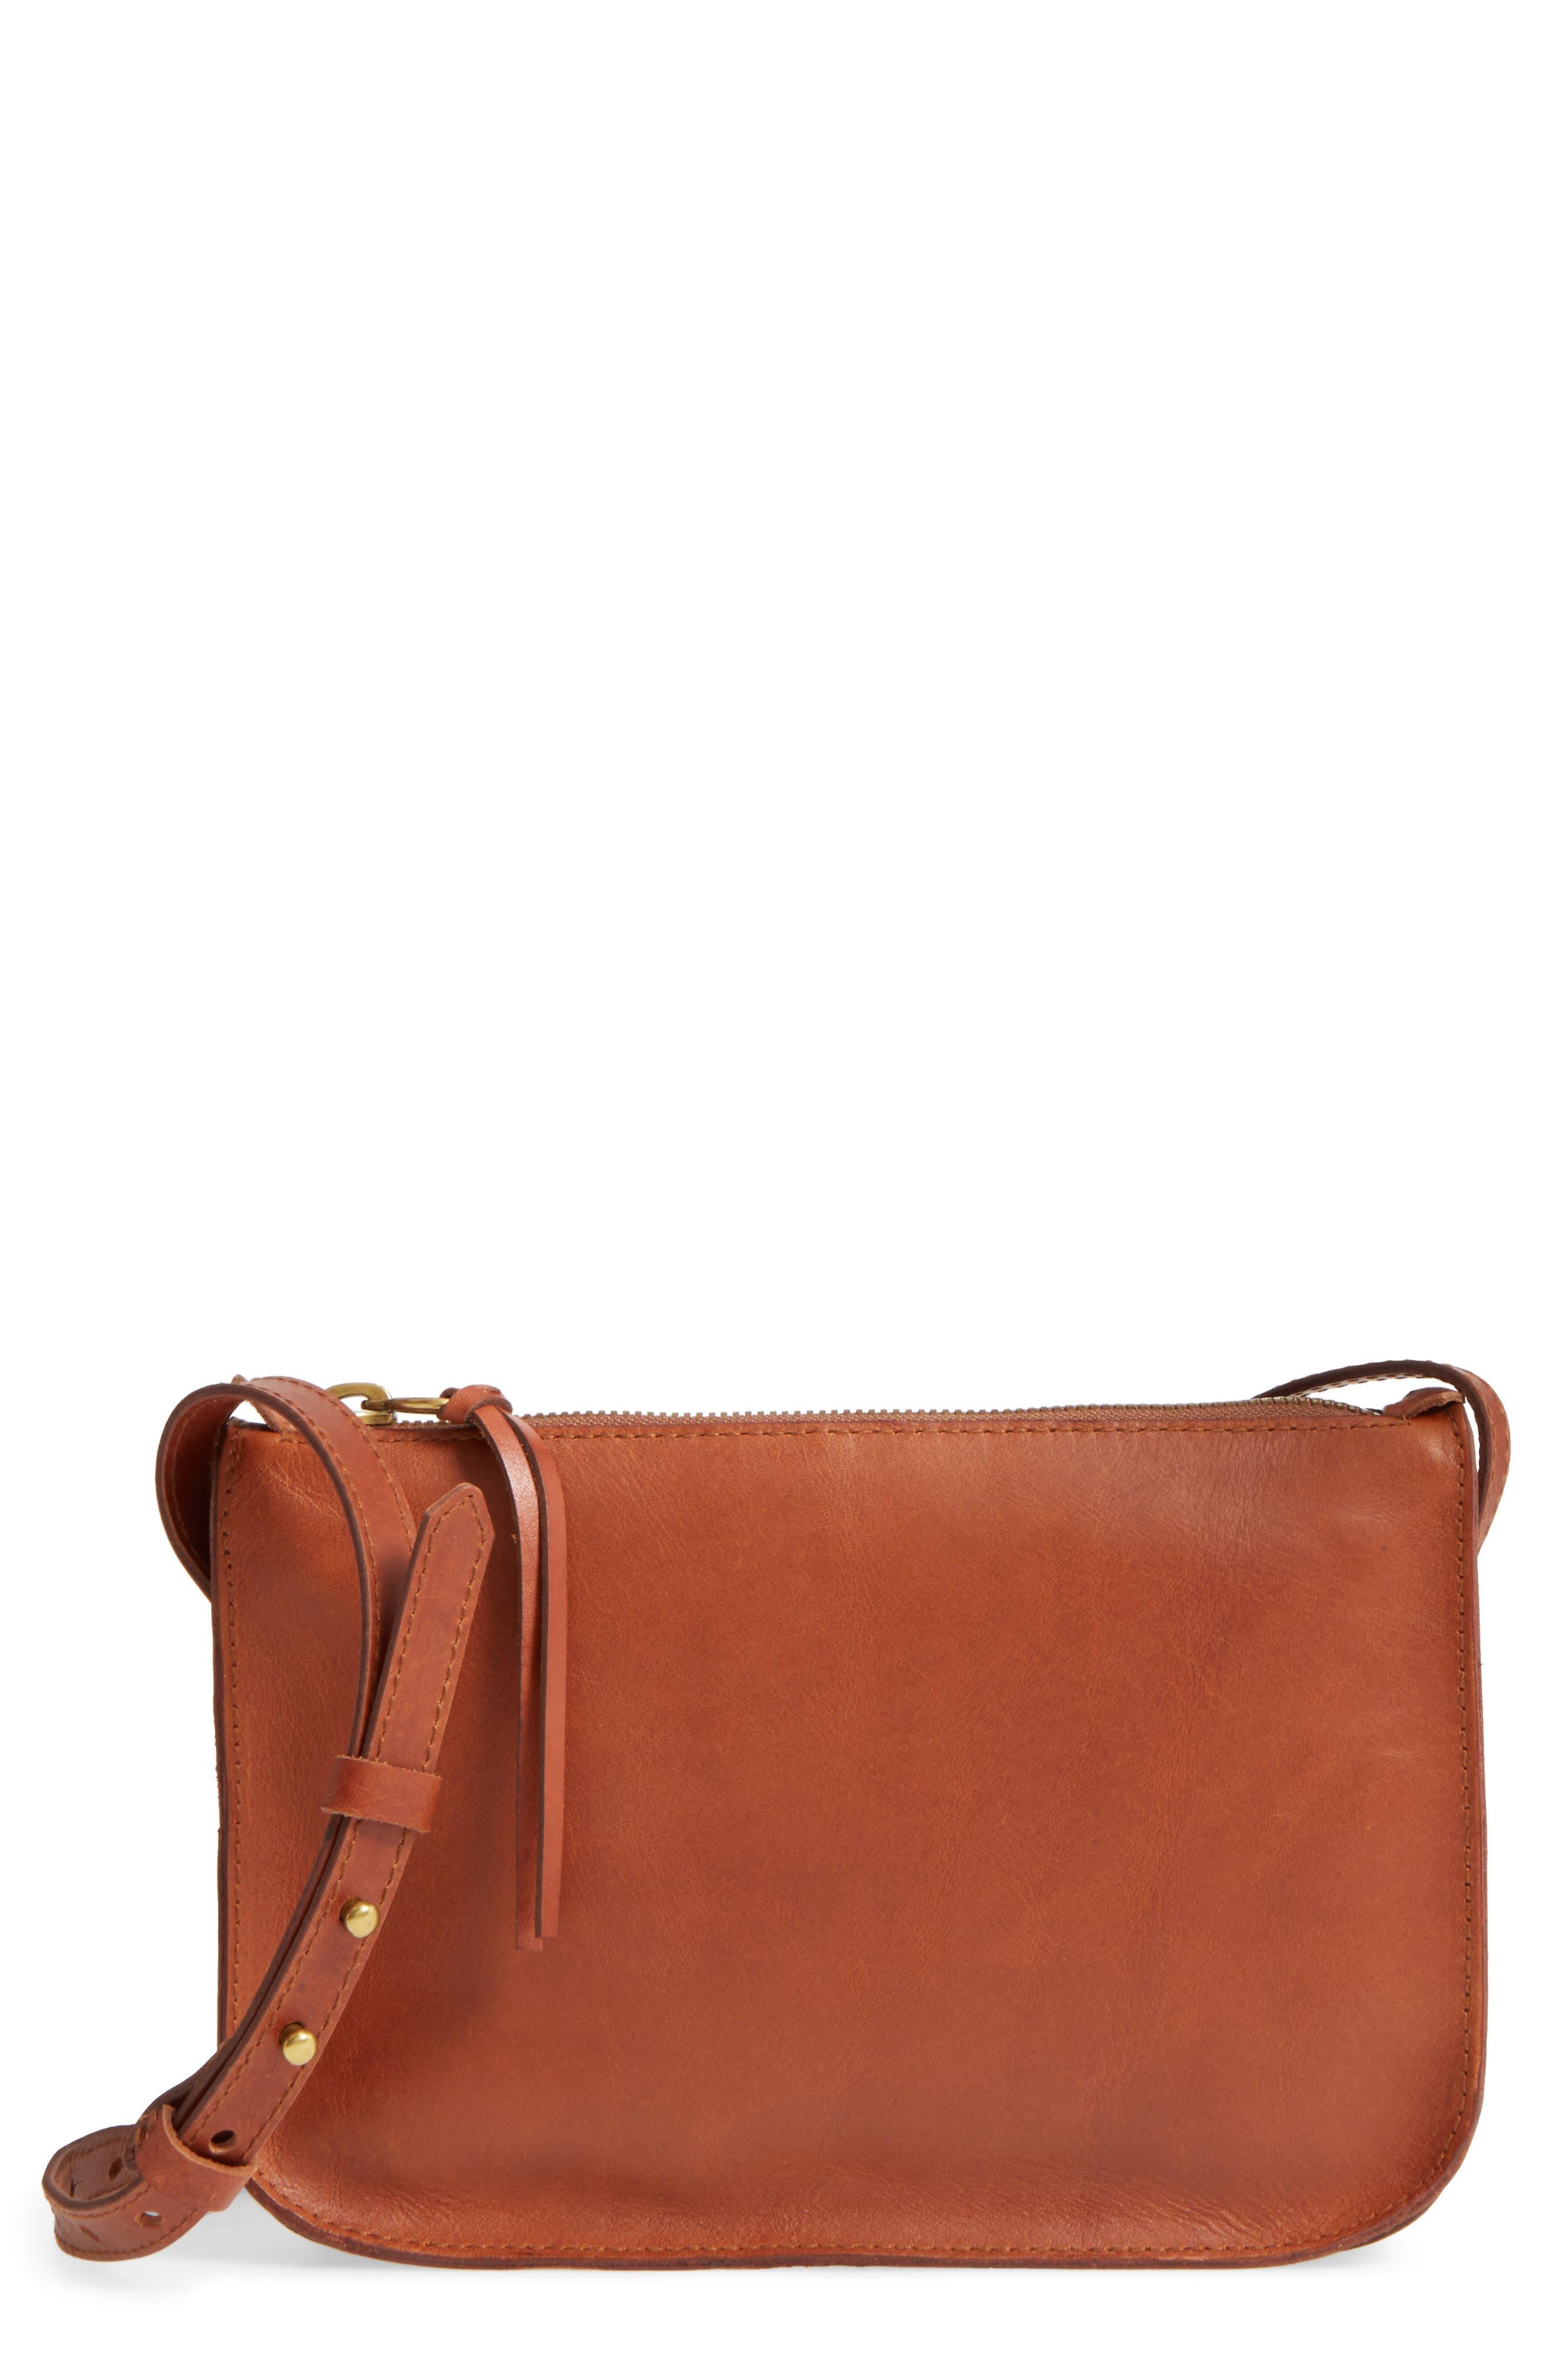 Madewell The Simple Leather Crossbody Bag